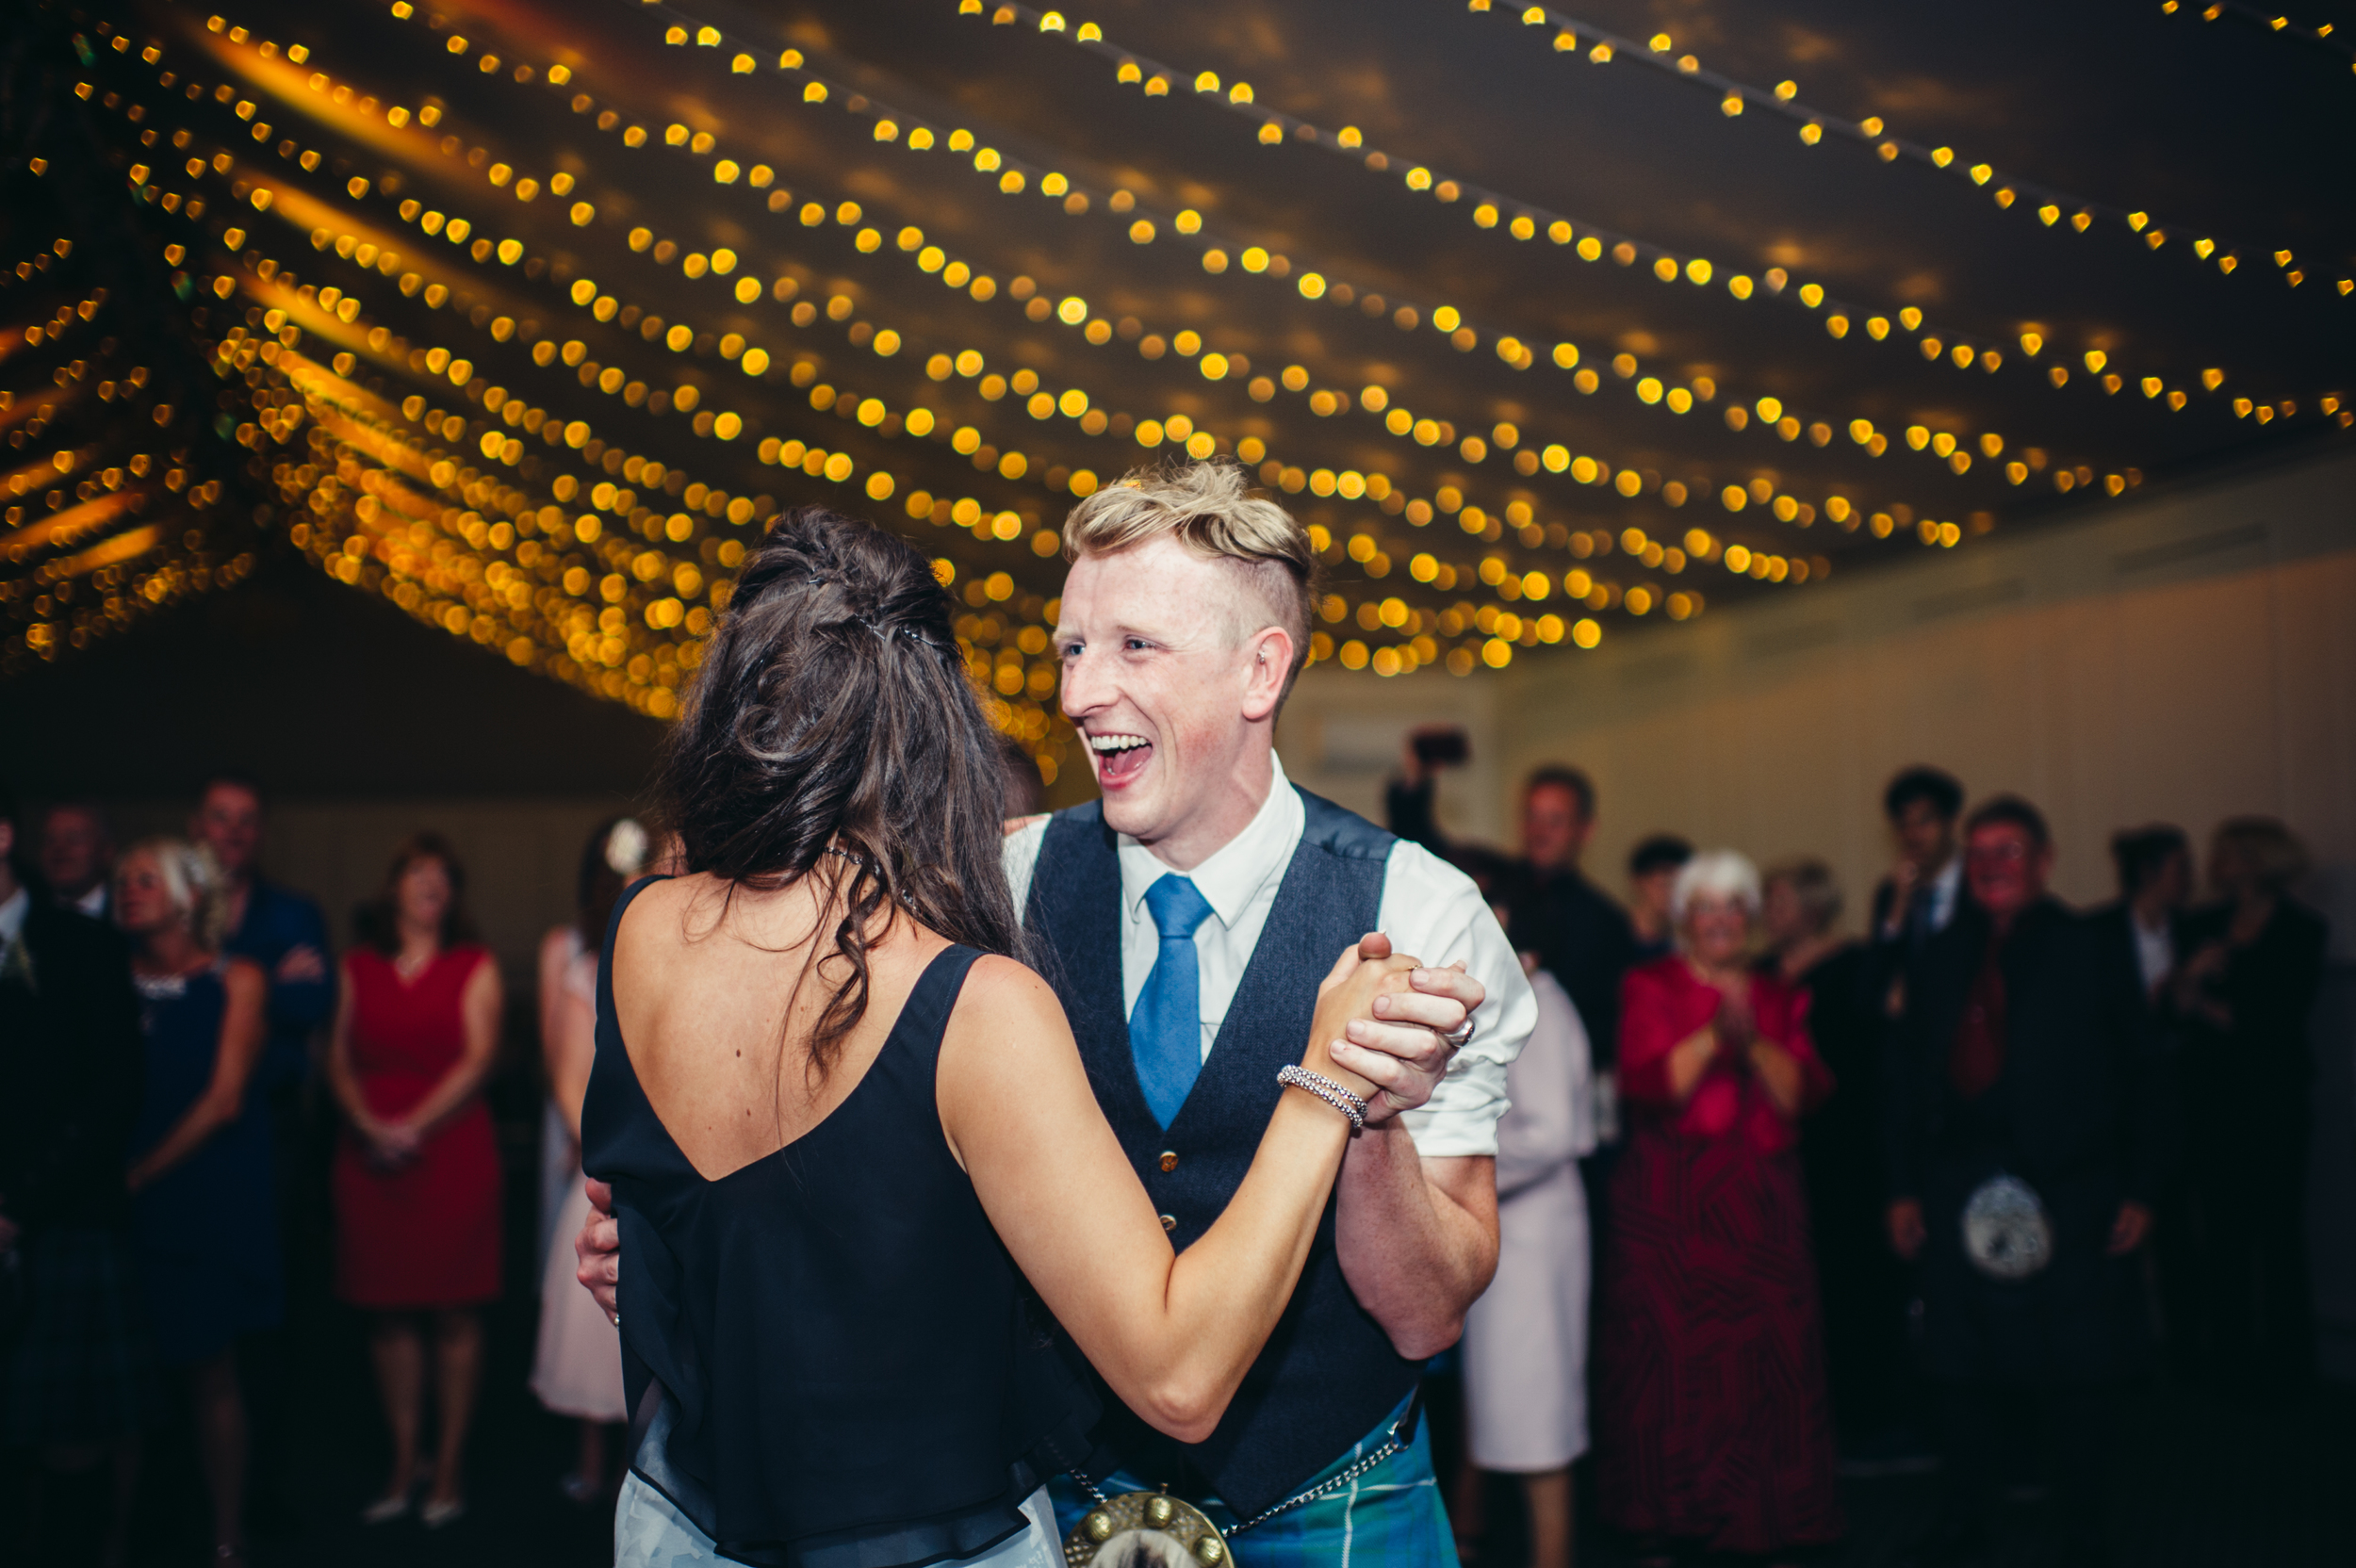 0184-lisa-devine-alternative-creative-wedding-photography-glasgow-edinburgh.JPG